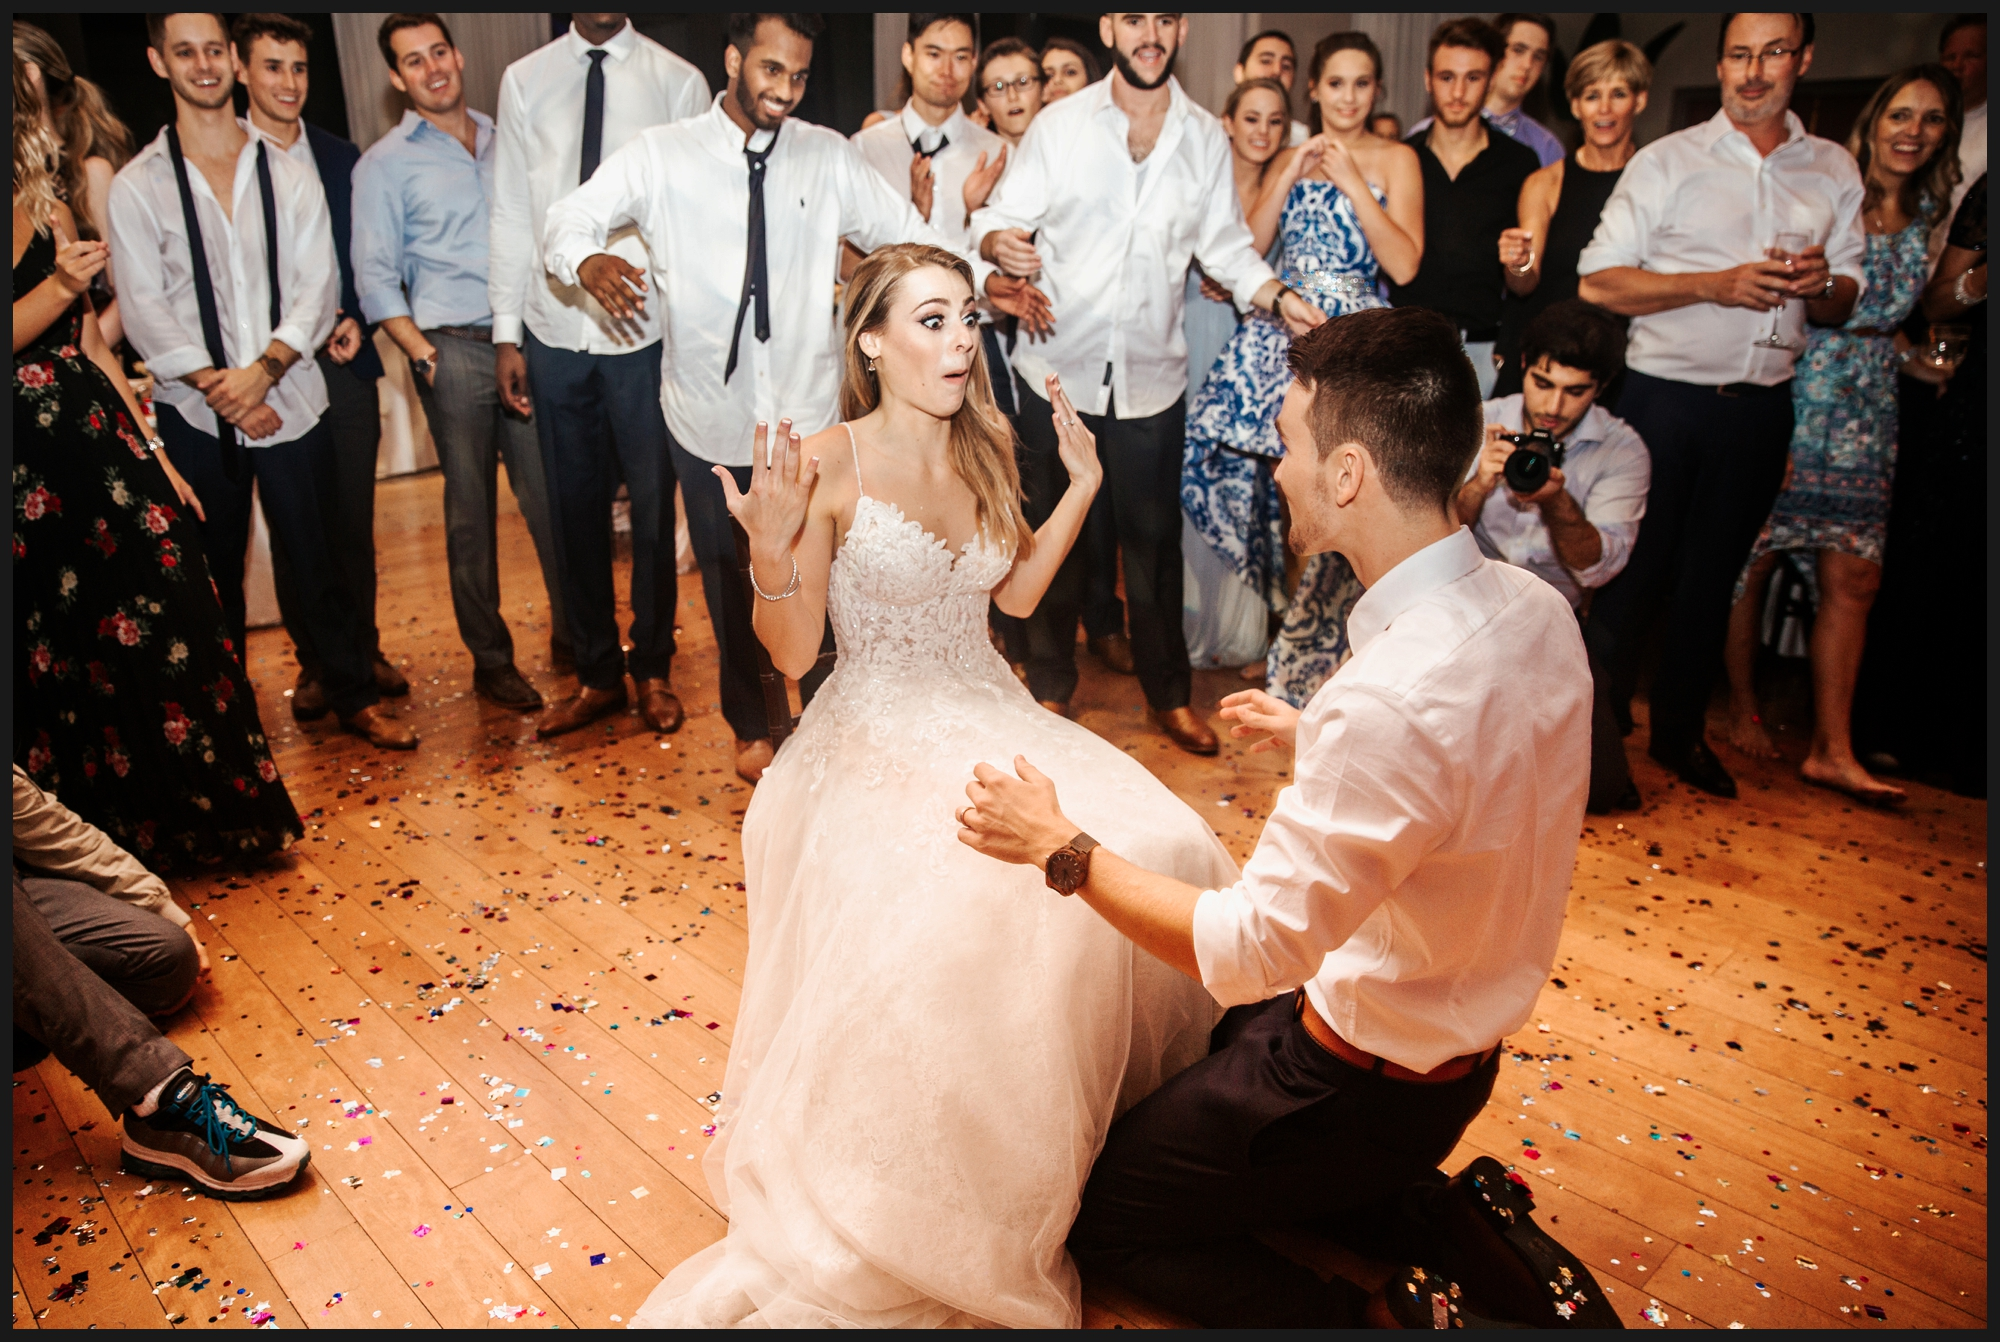 Orlando-Wedding-Photographer-destination-wedding-photographer-florida-wedding-photographer-bohemian-wedding-photographer_0136.jpg